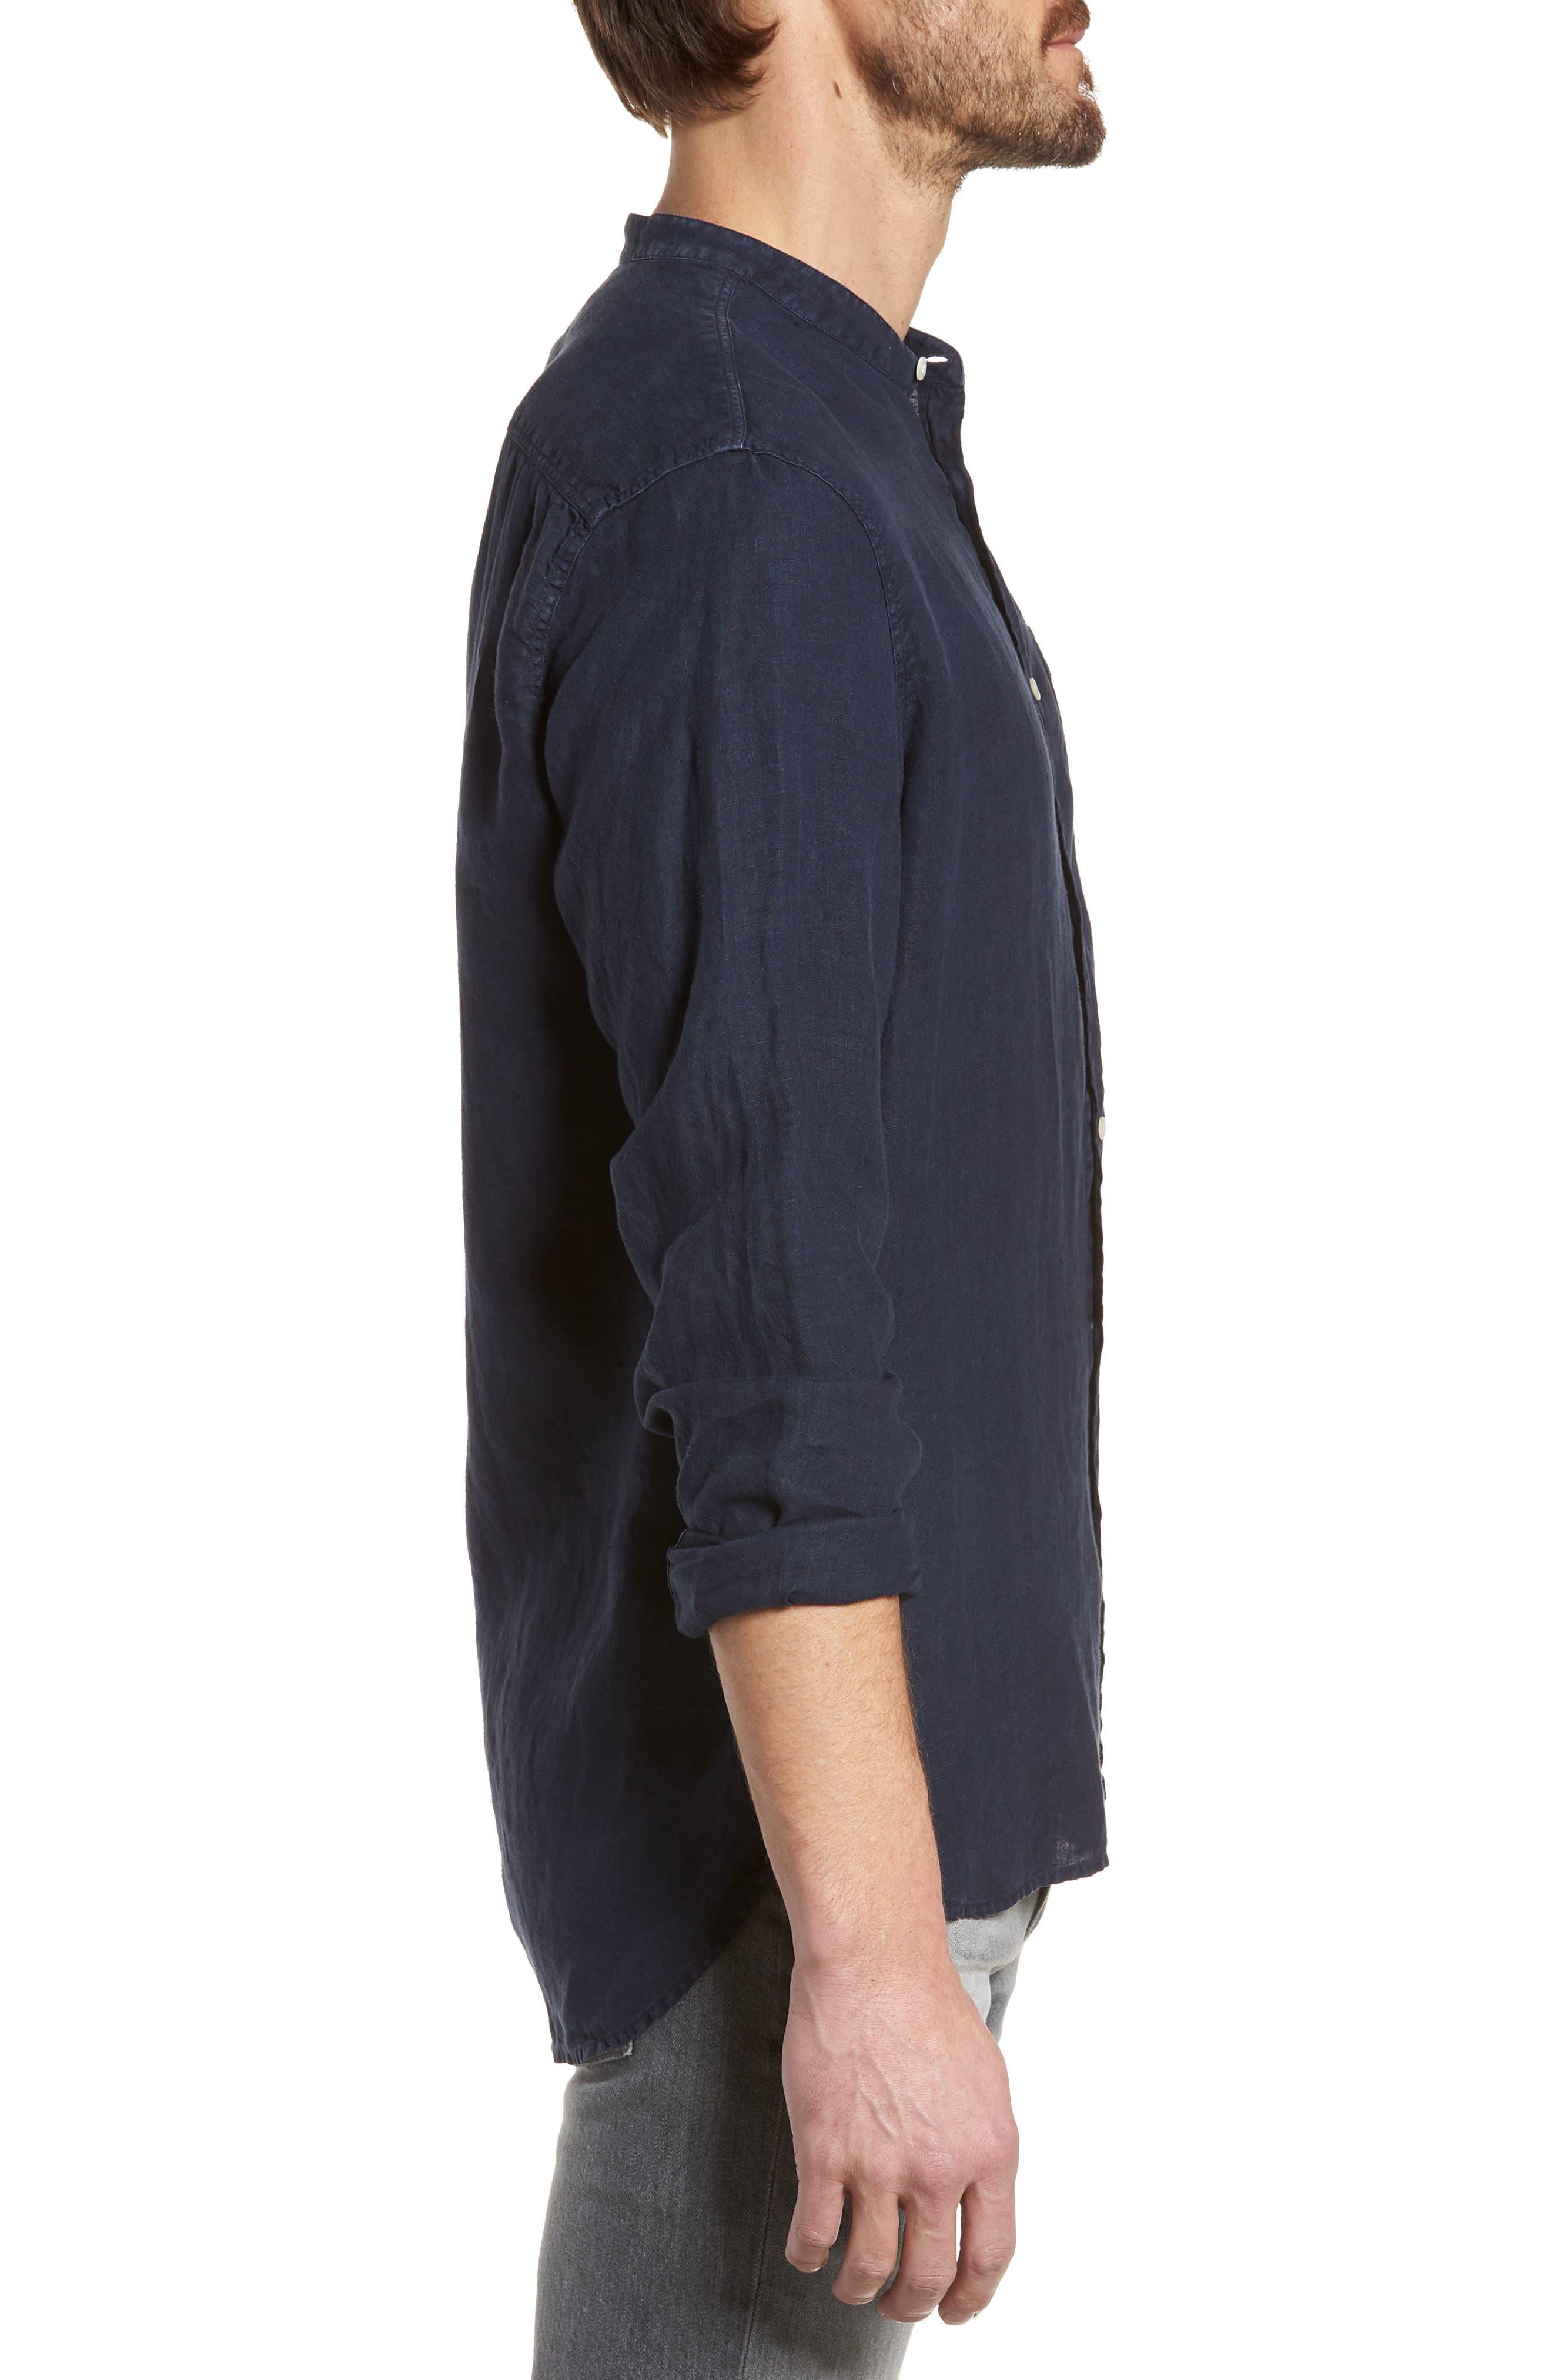 & Bros. Regular Fit Band Collar Linen Shirt,                             Alternate thumbnail 3, color,                             477